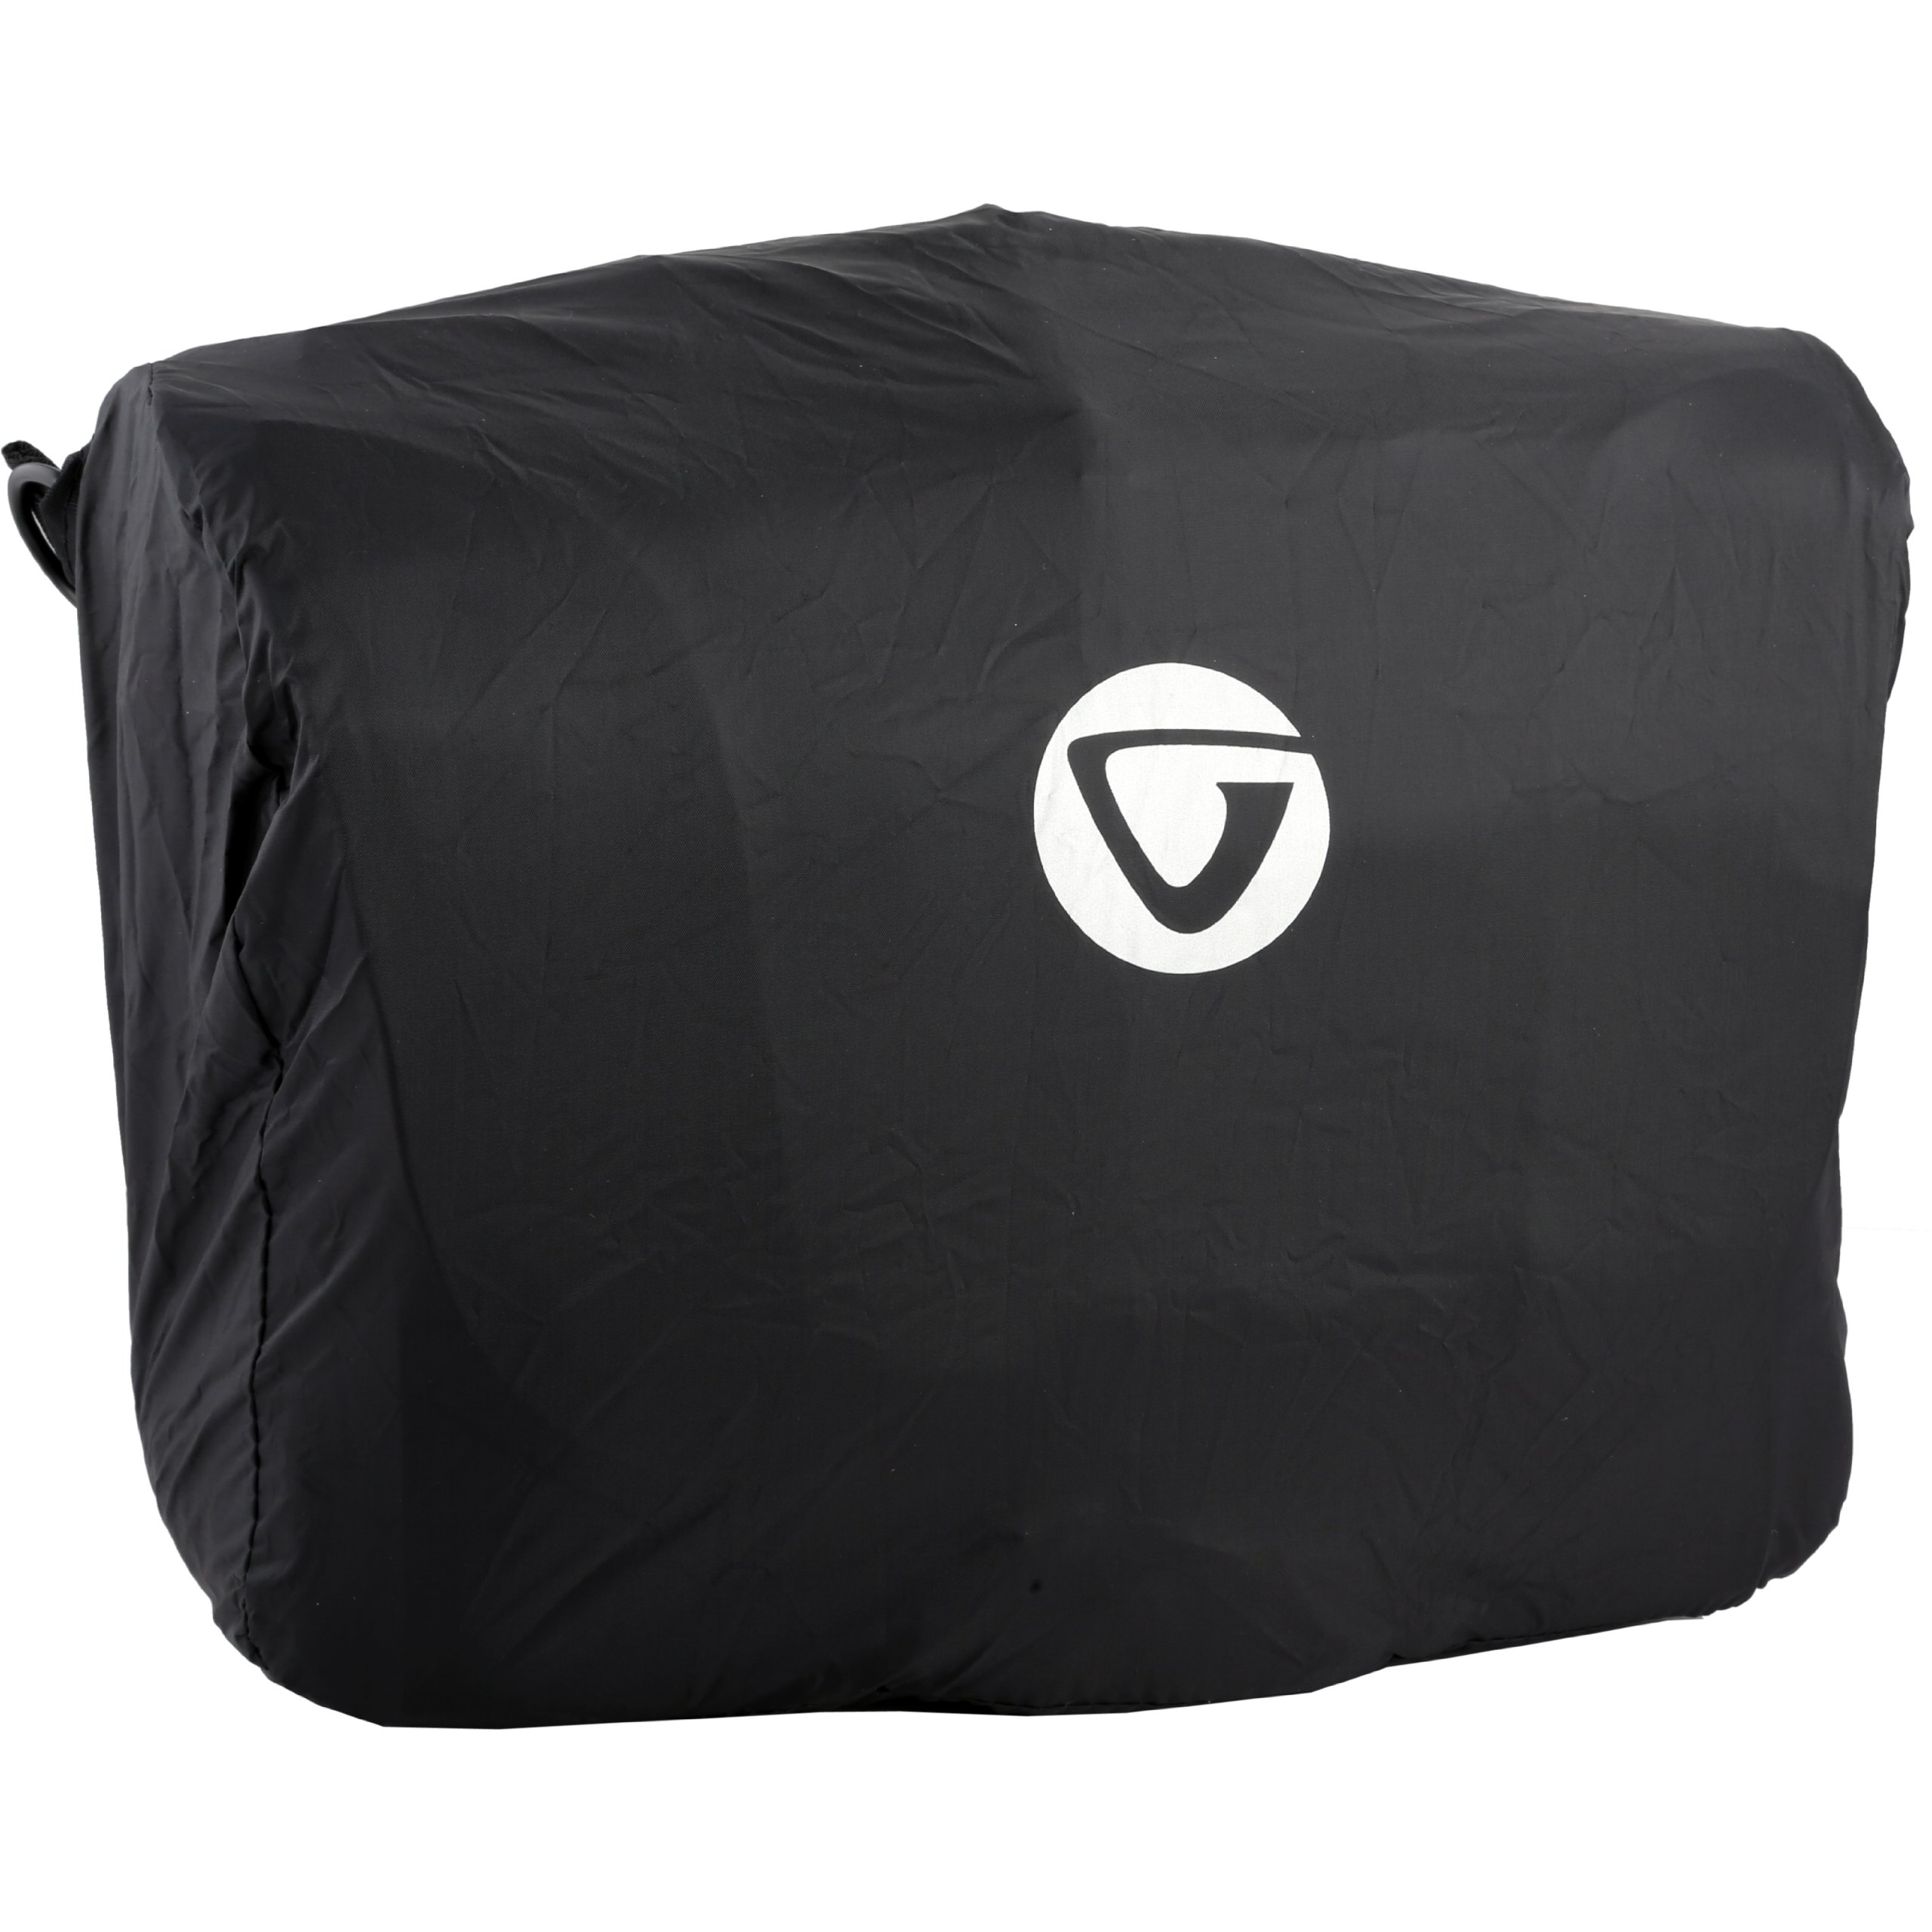 Vanguard Up-Rise II 28 Messenger Bag [VGBUPRISEII28]